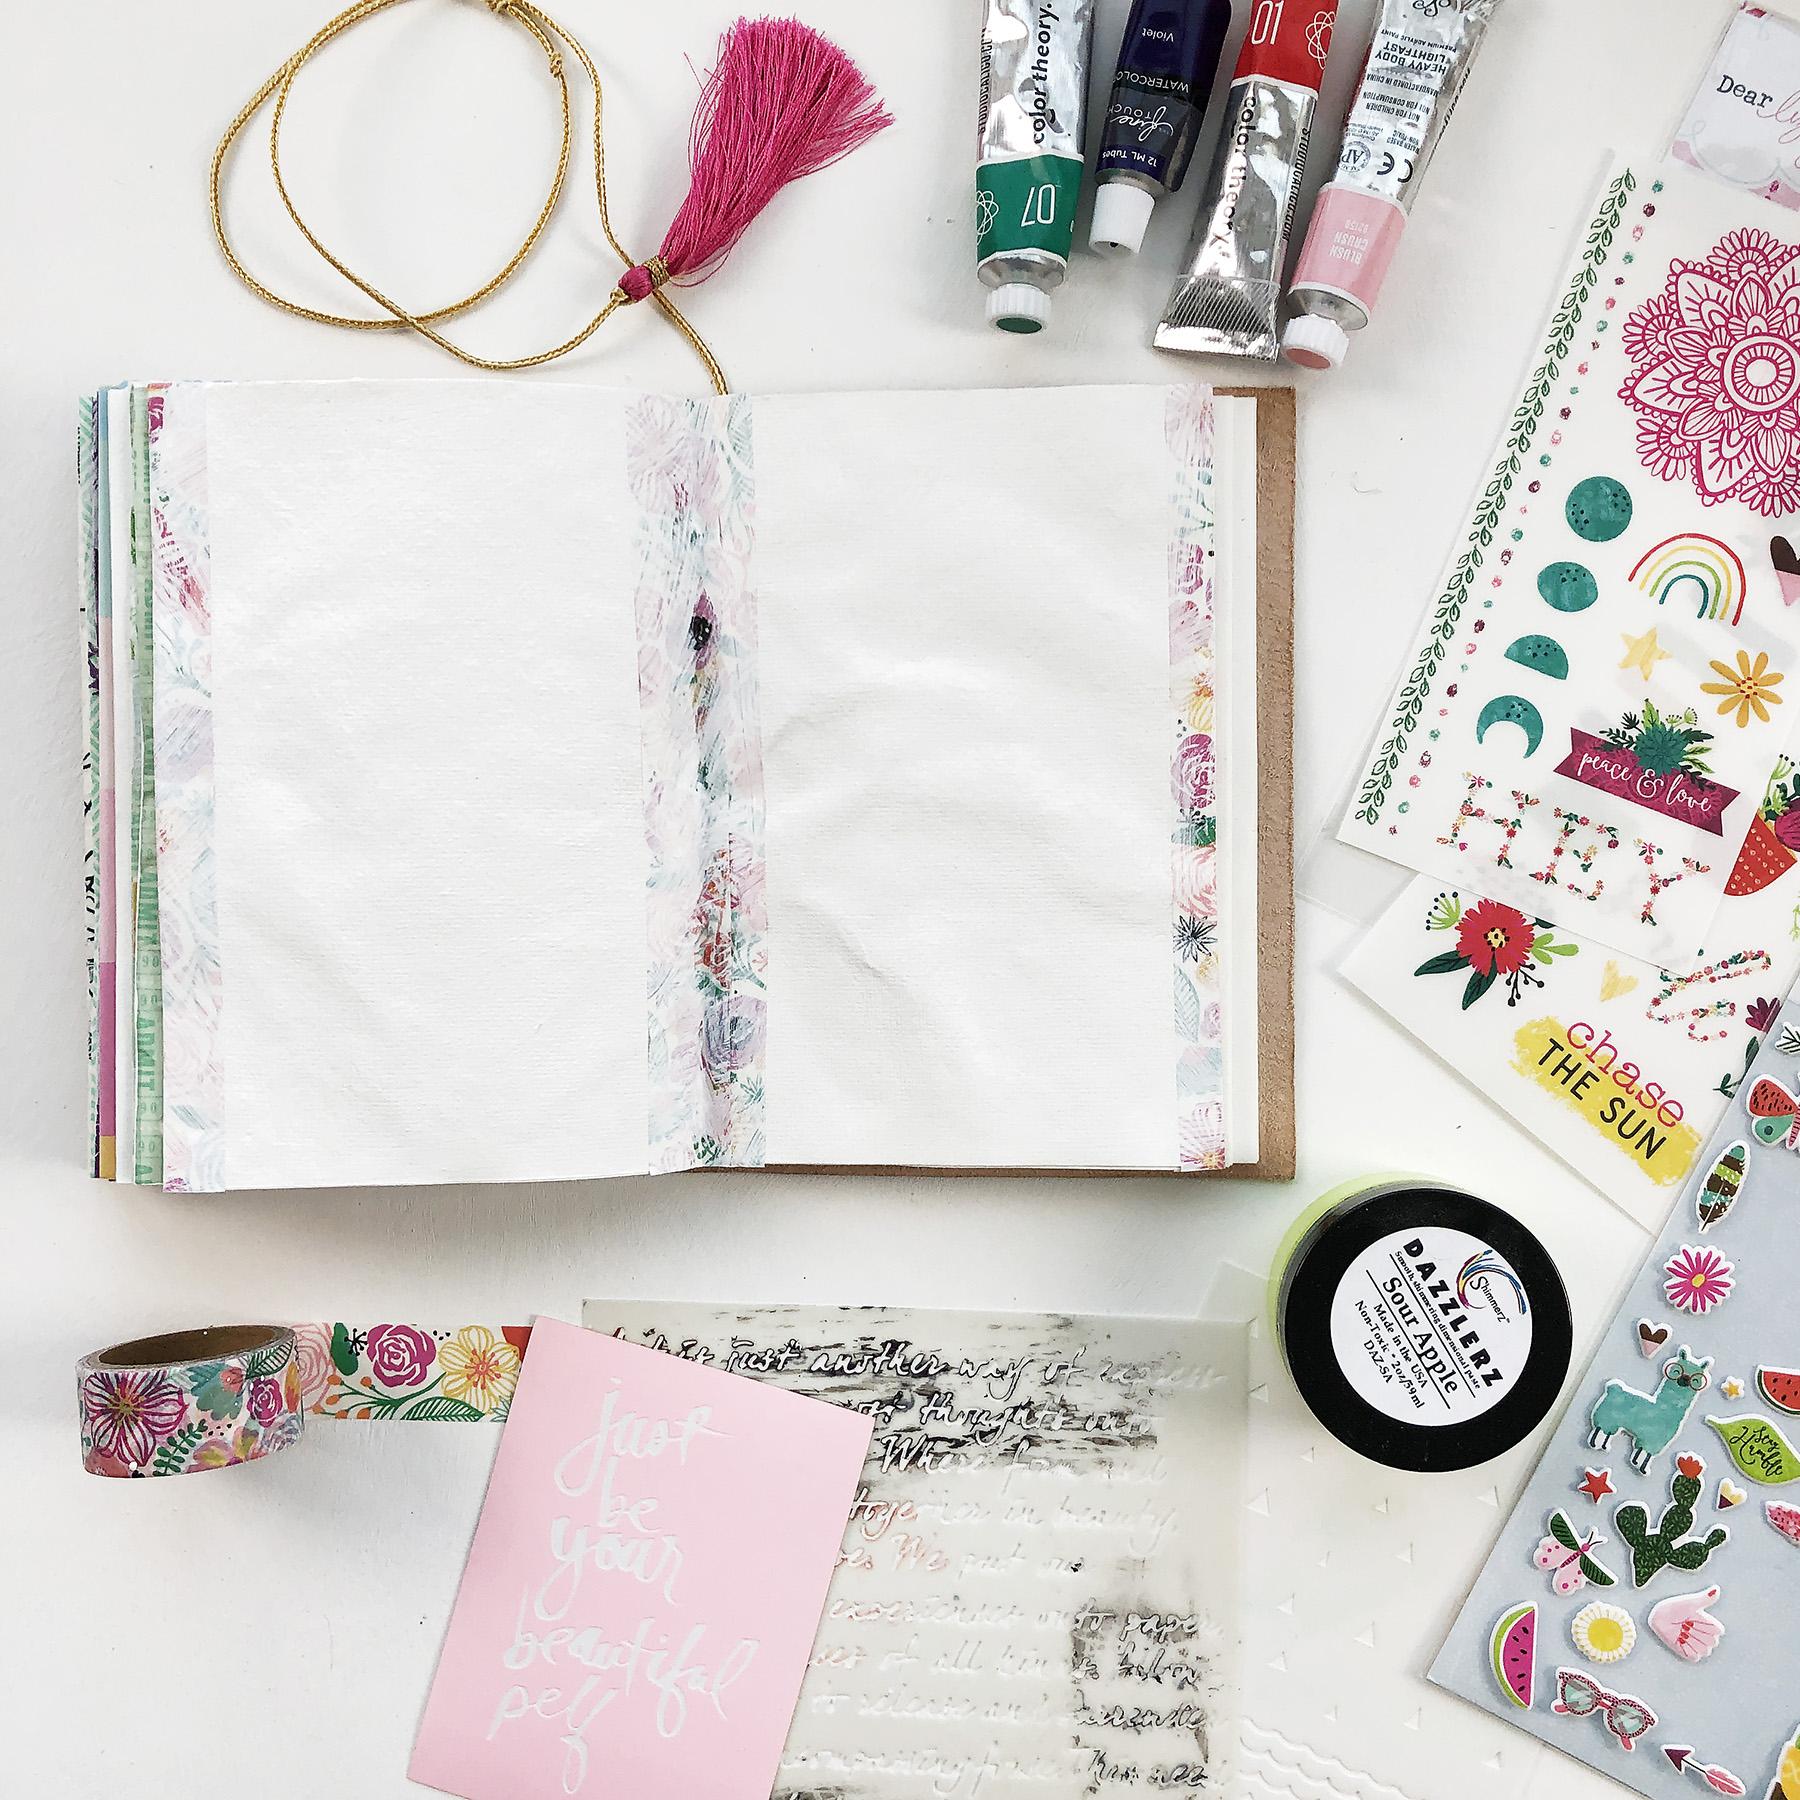 Larkindesign Art Journal Volume 04 | Your Beautiful Selfv